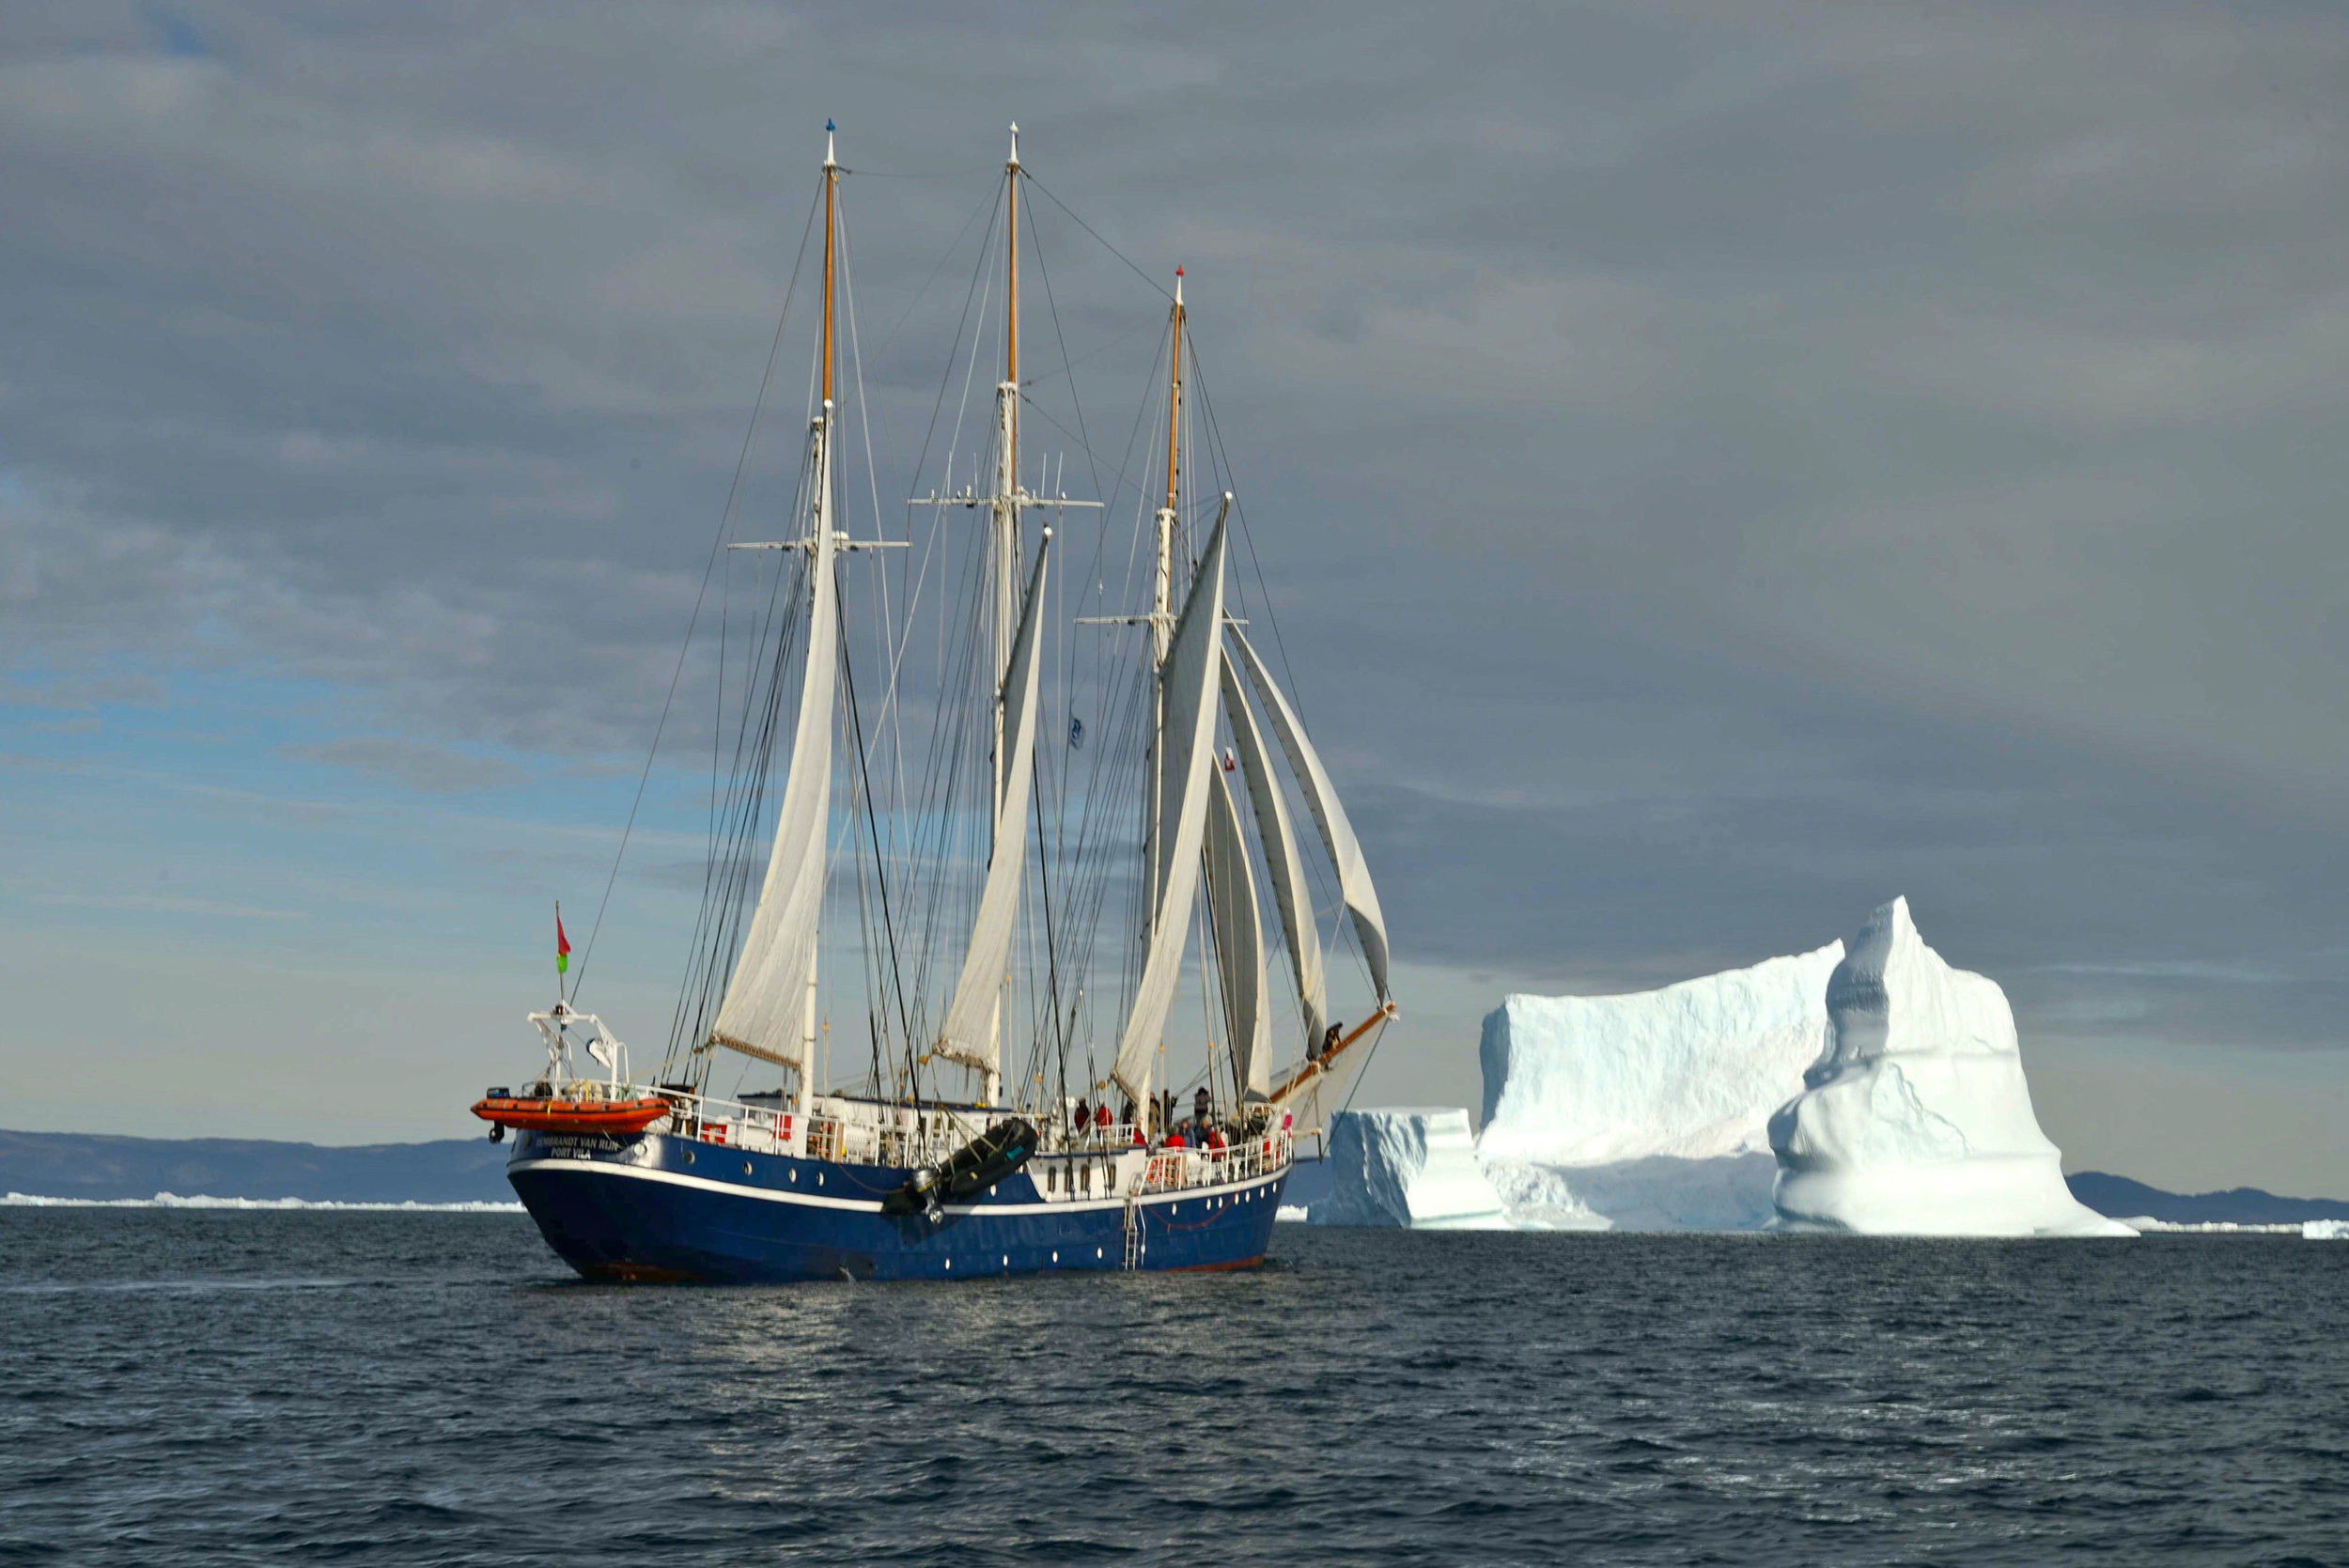 Rembrandt-van-Rijn-under-sail,-Greenland_Tarik-Checkchak.jpg